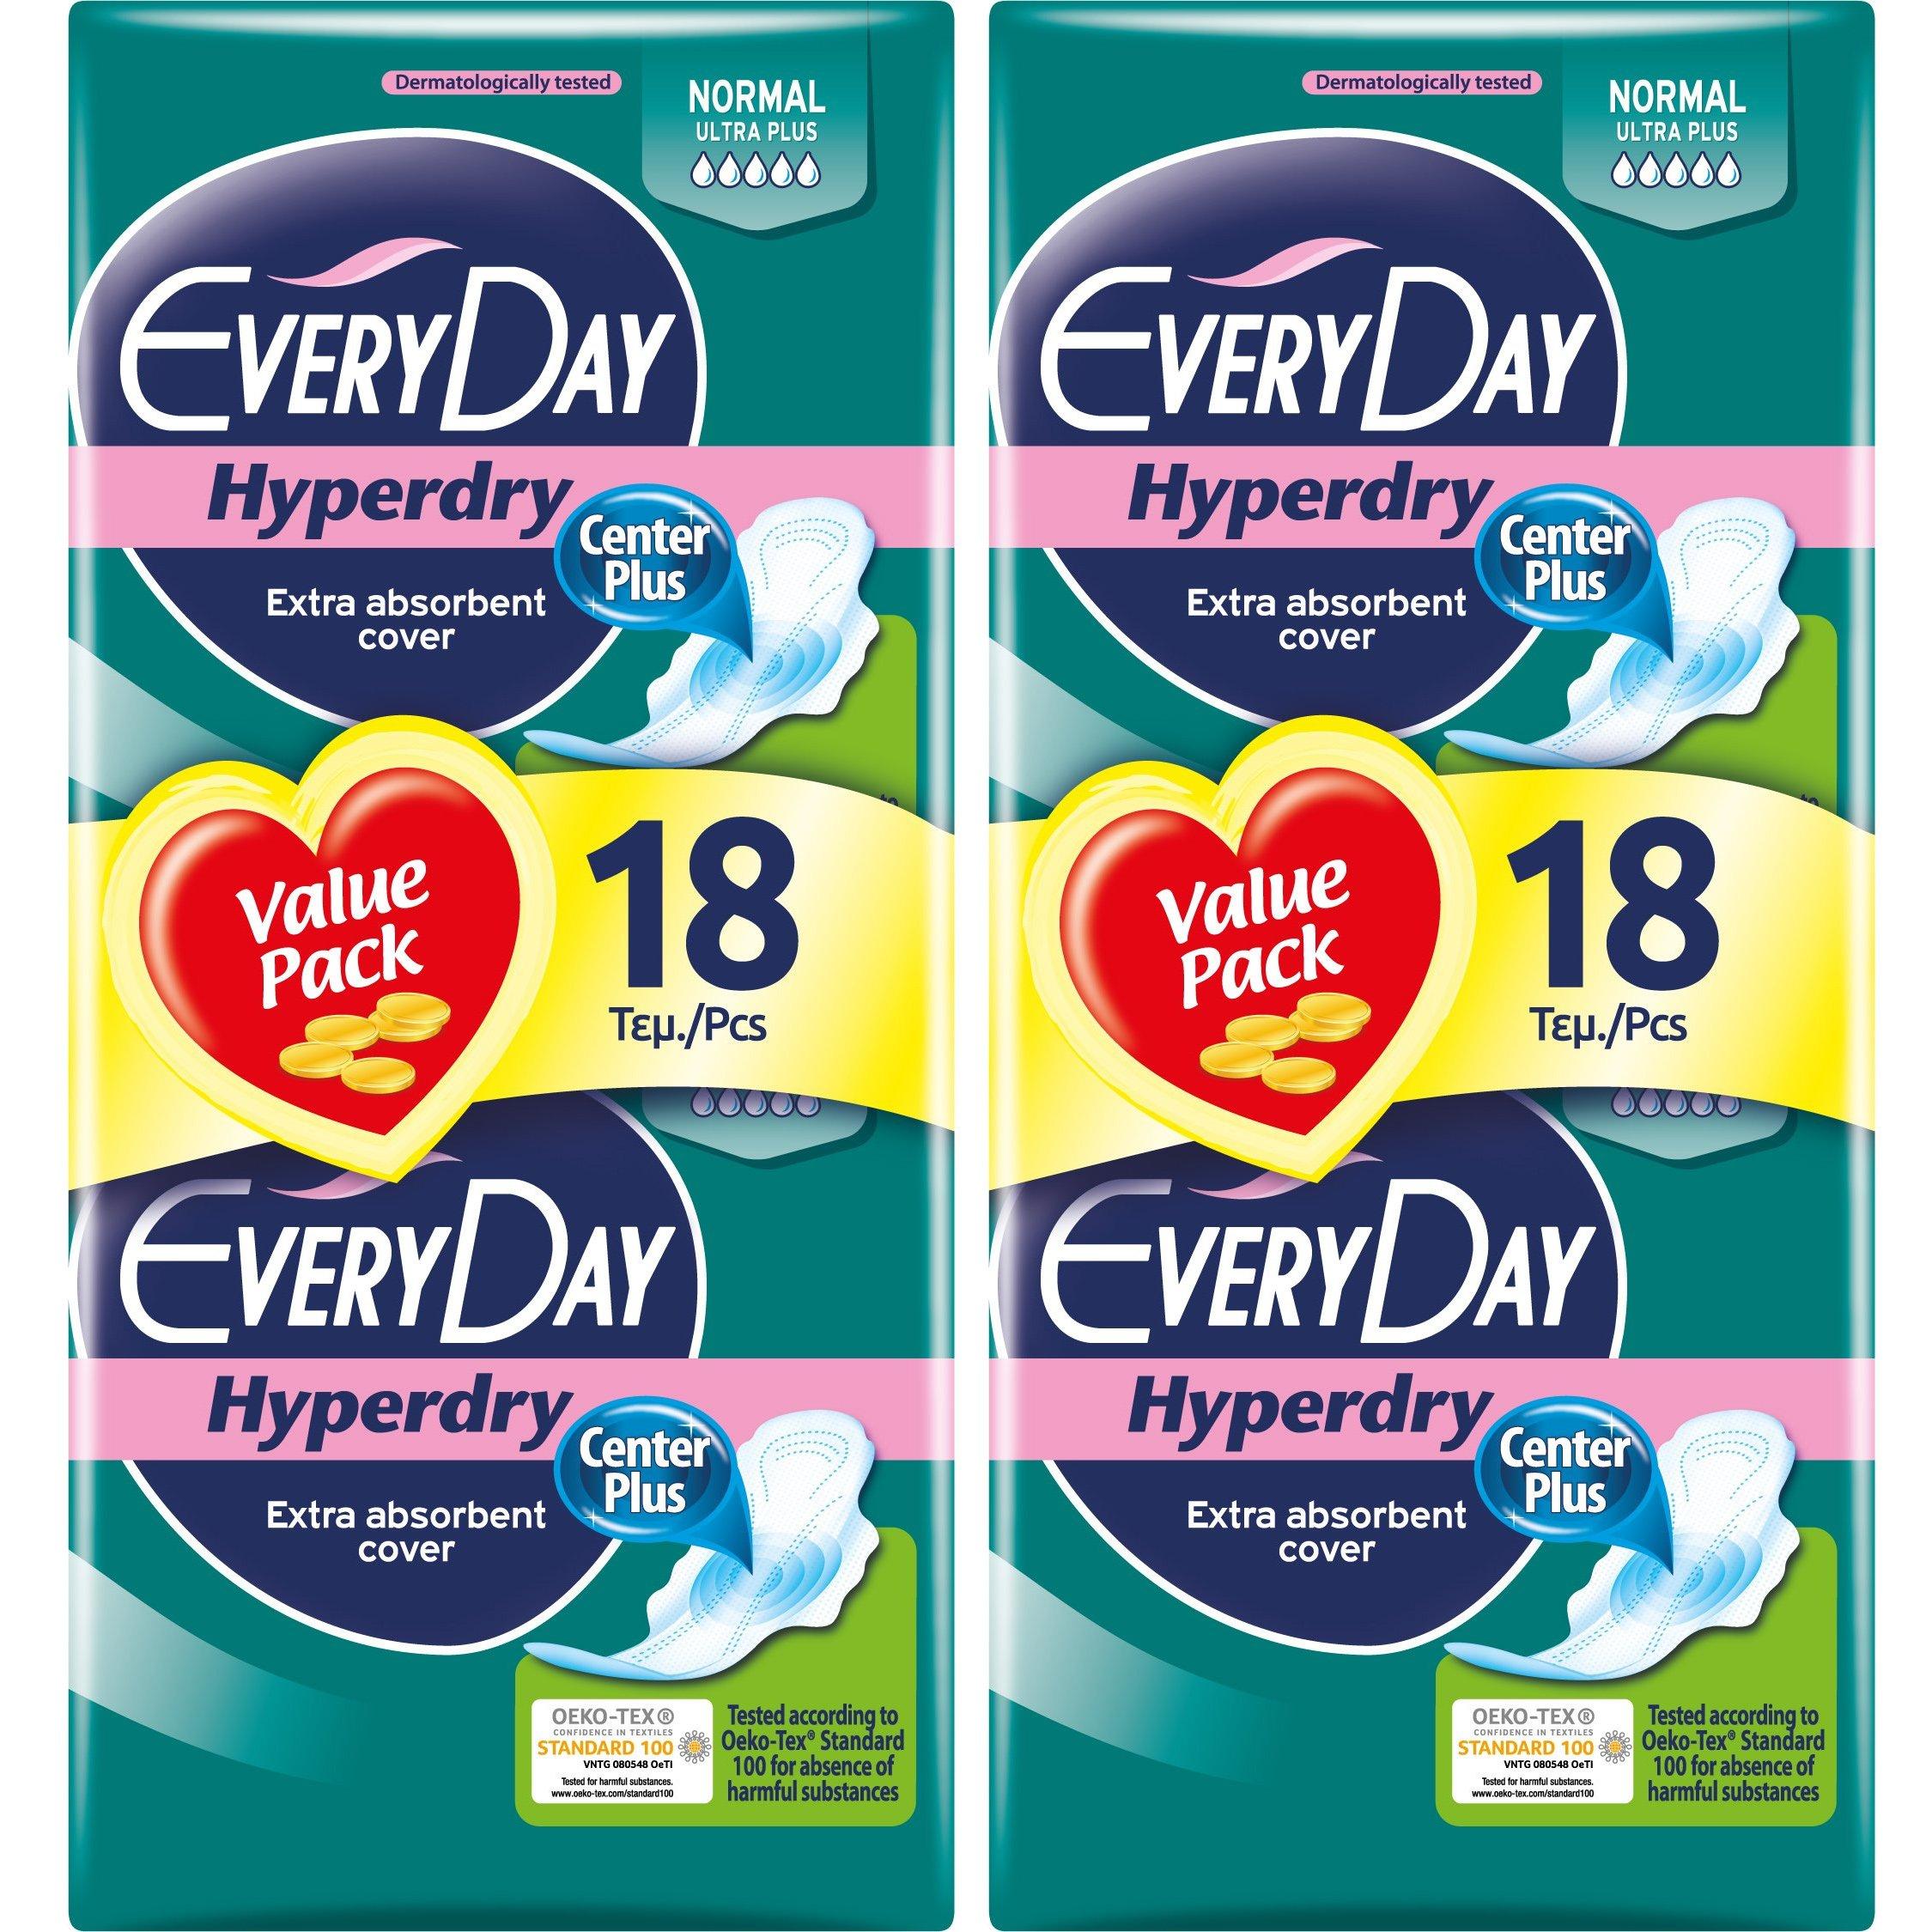 Every Day Πακέτο Προσφοράς Hyperdry Normal Ultra Plus Value Pack Σερβιέτες Ιδανικές για Κανονική Ροή 2×18 Τεμάχια 1+1 Δώρο